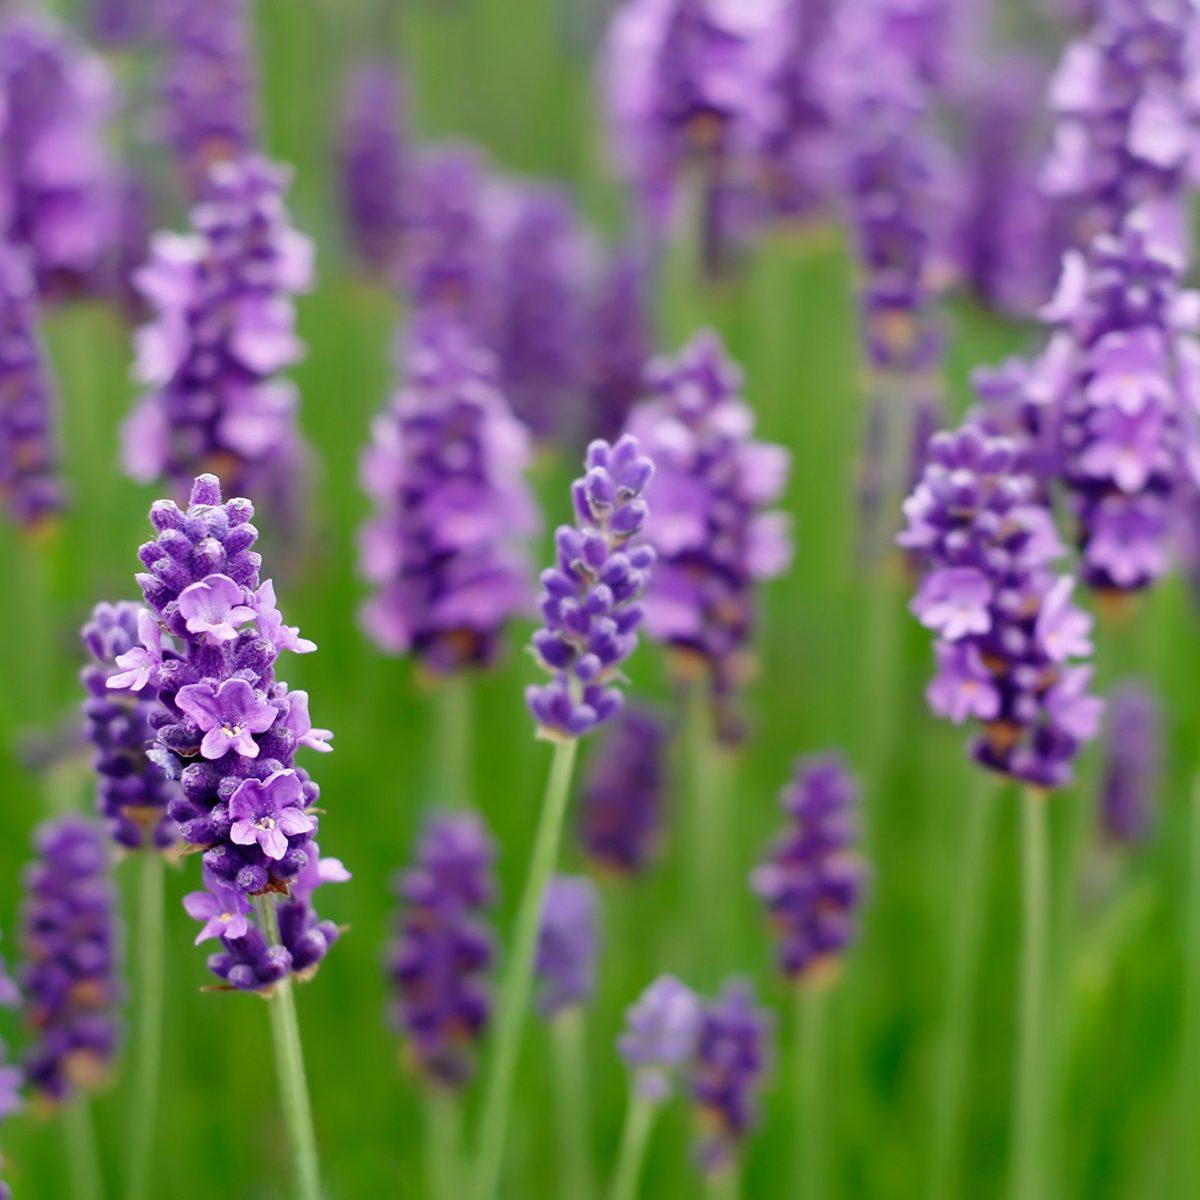 Lavender flowers blooming in a field